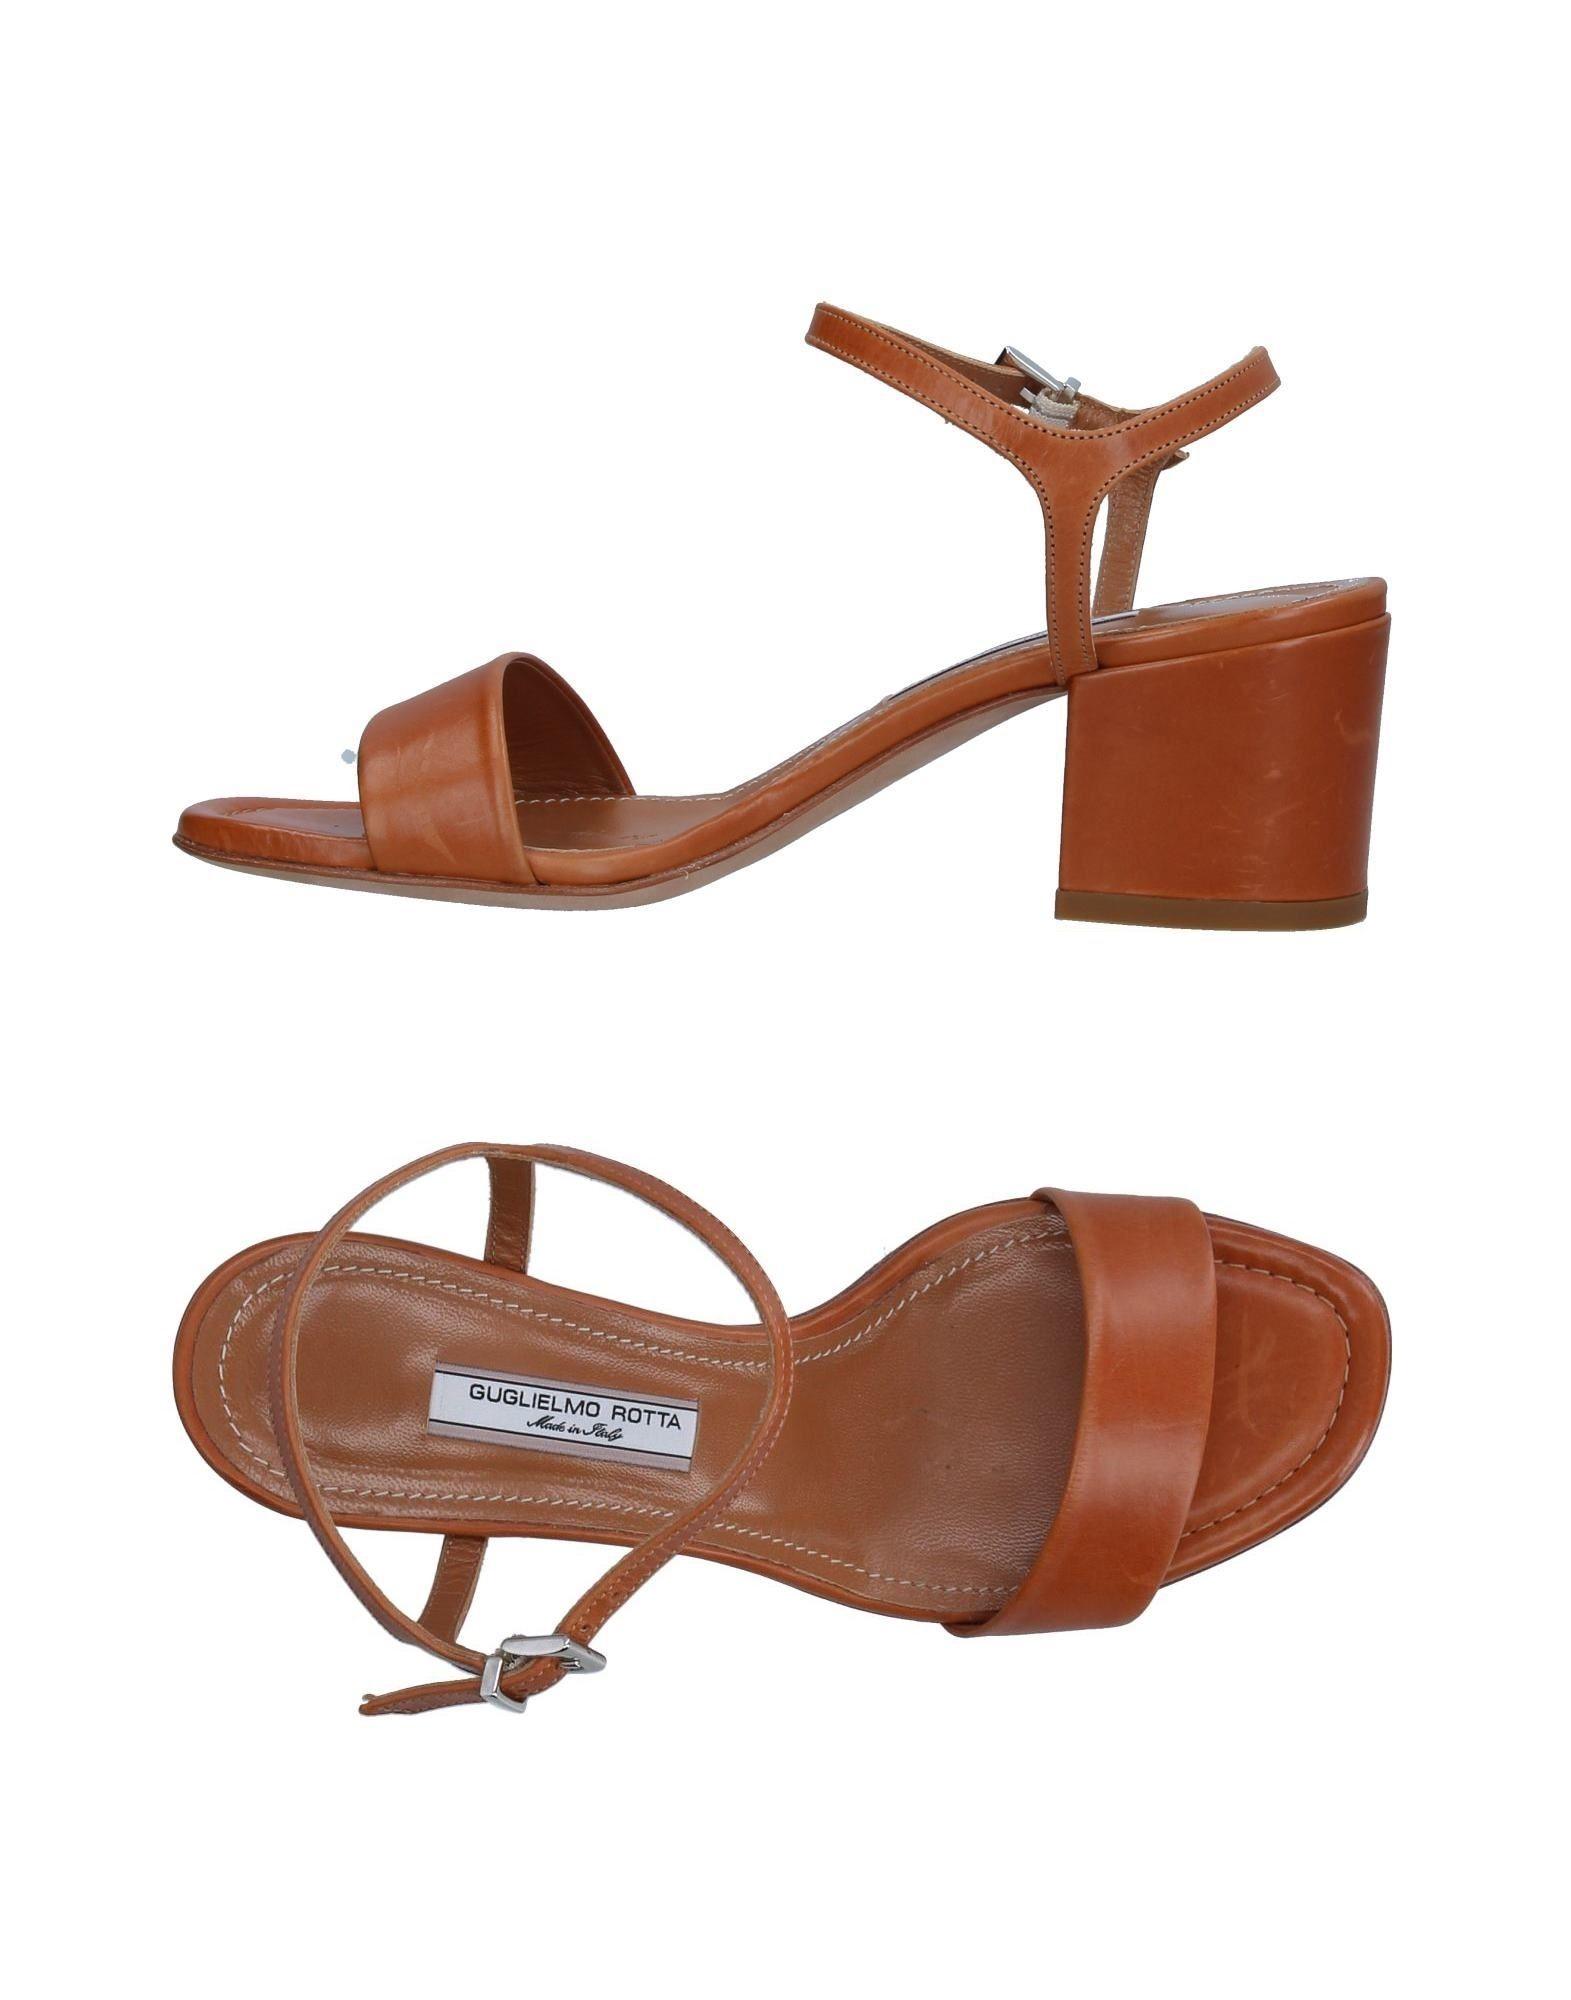 Chaussures - Sandales Guglielmo Rotta 3ogBFH